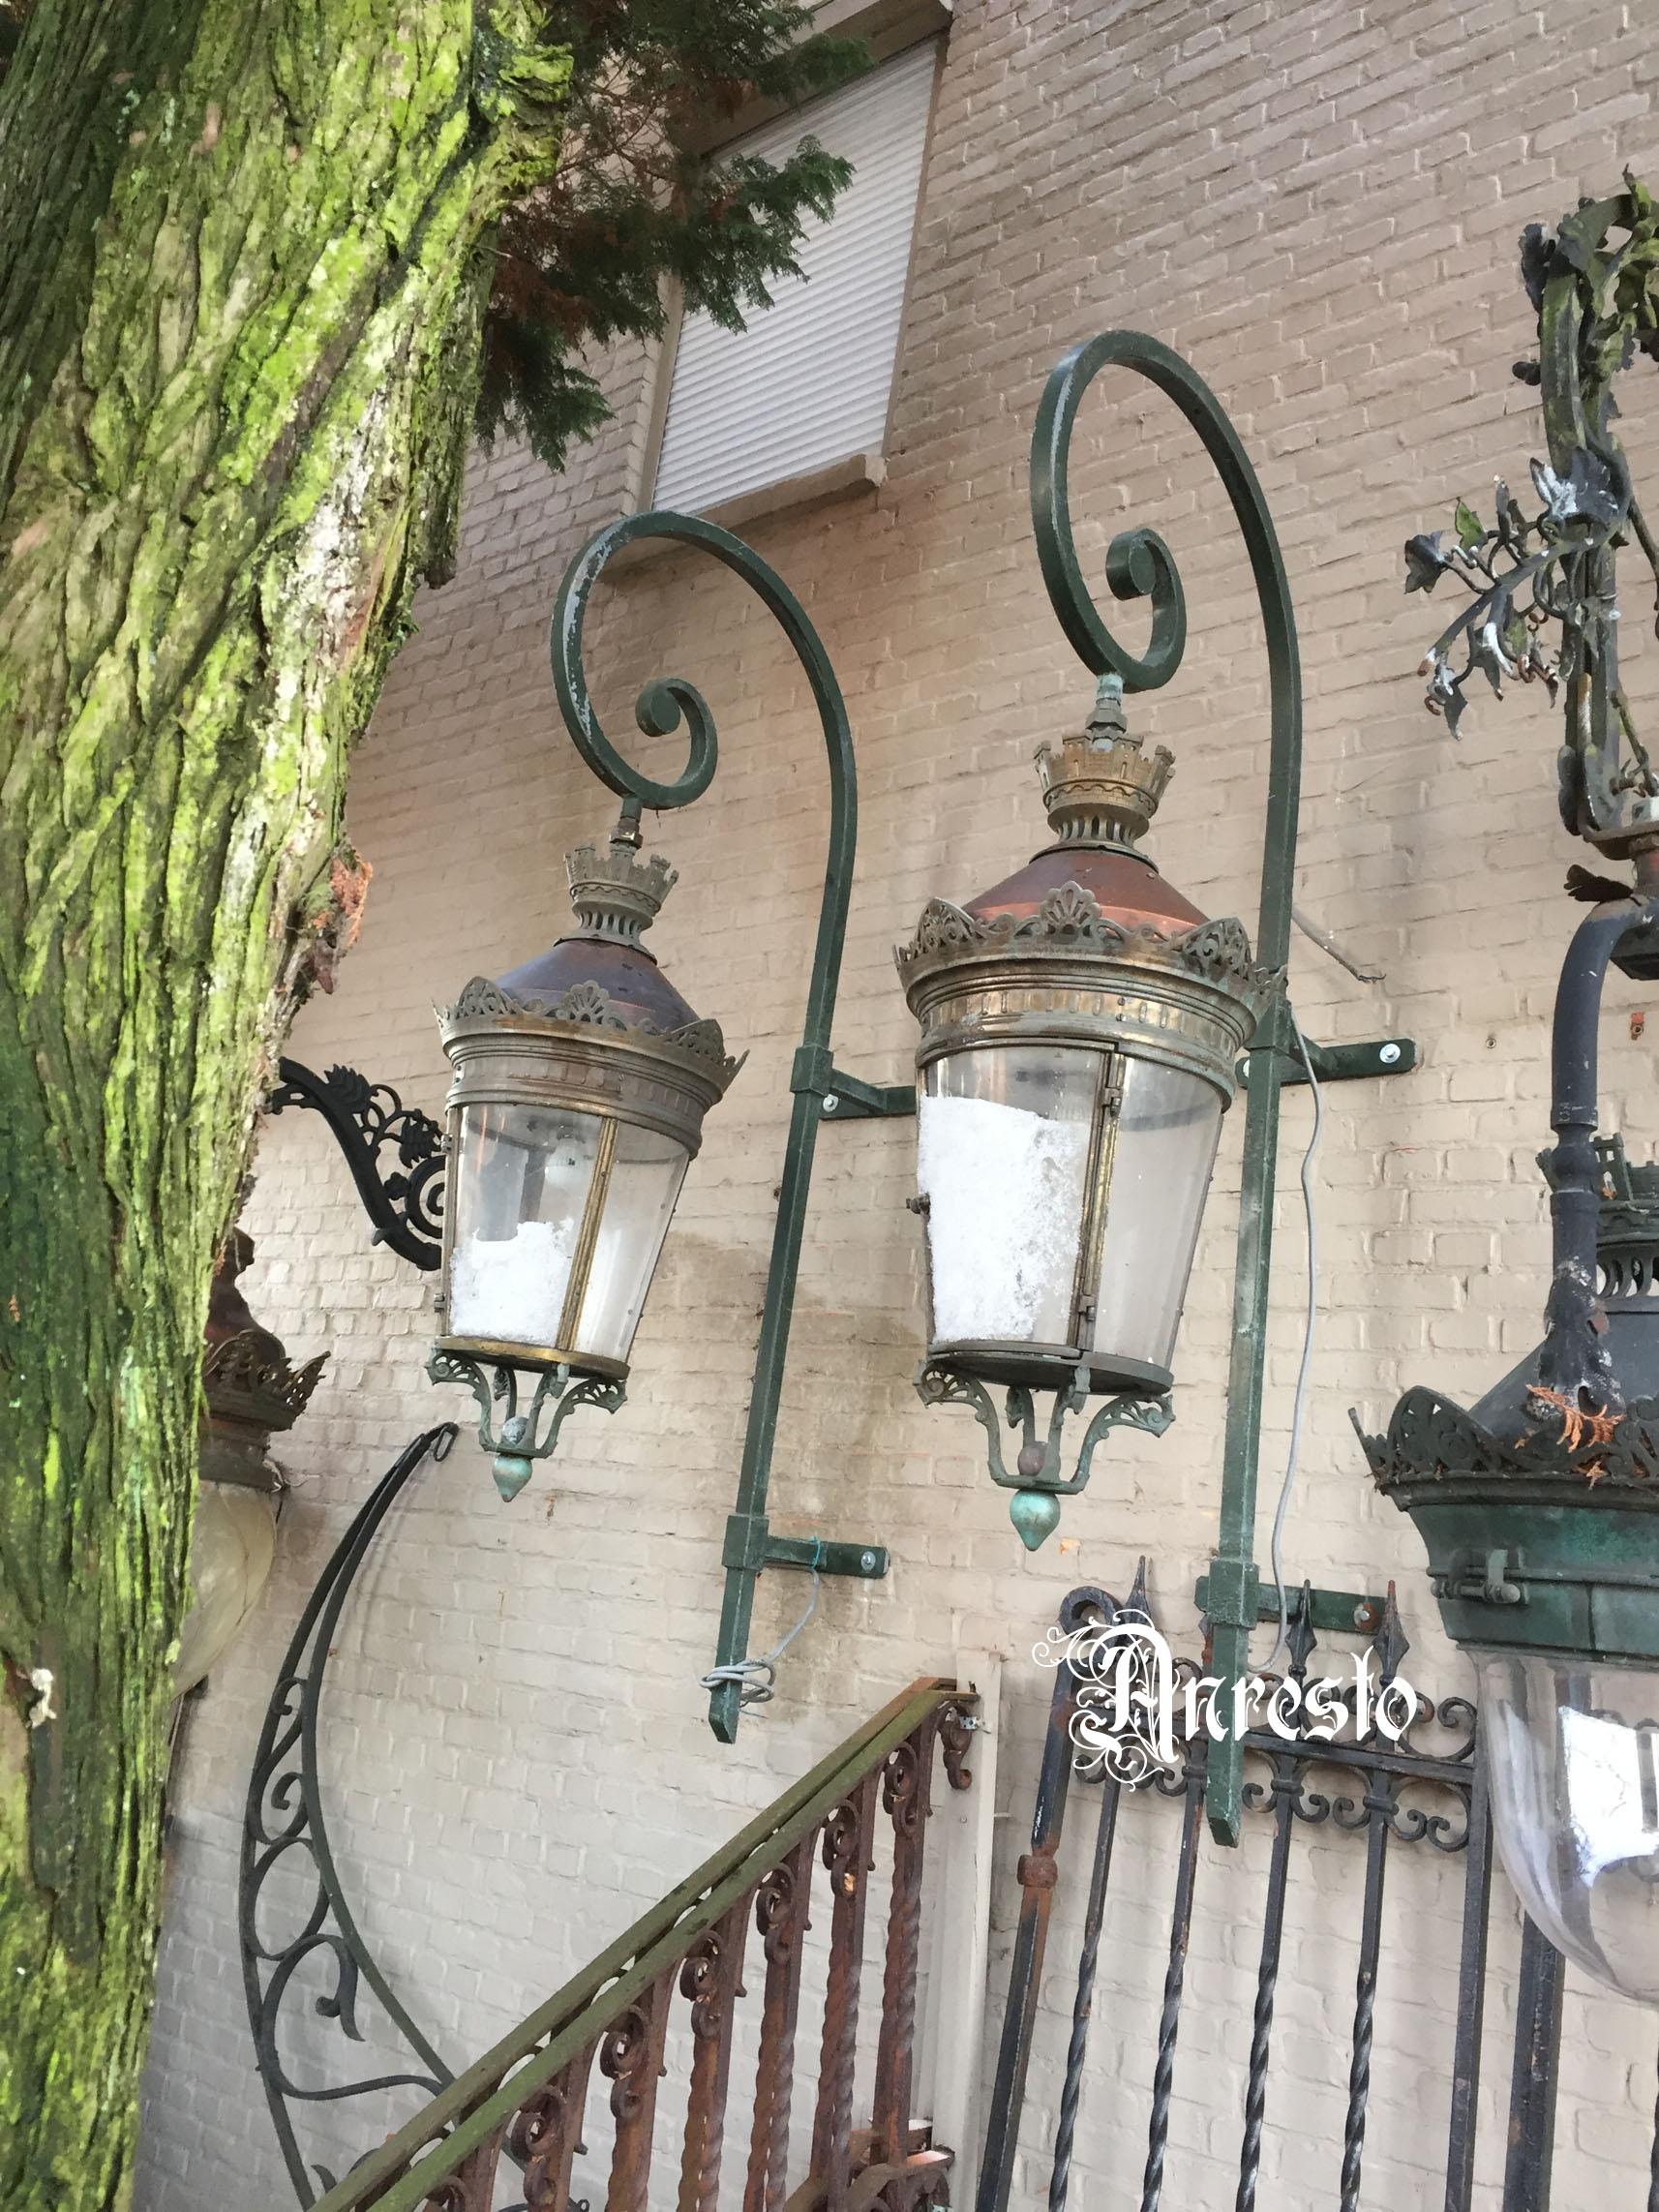 Ongekend Antieke Tuinlampen Buitenverlichting Lantaarns: ANRESTO Antiek JJ-78